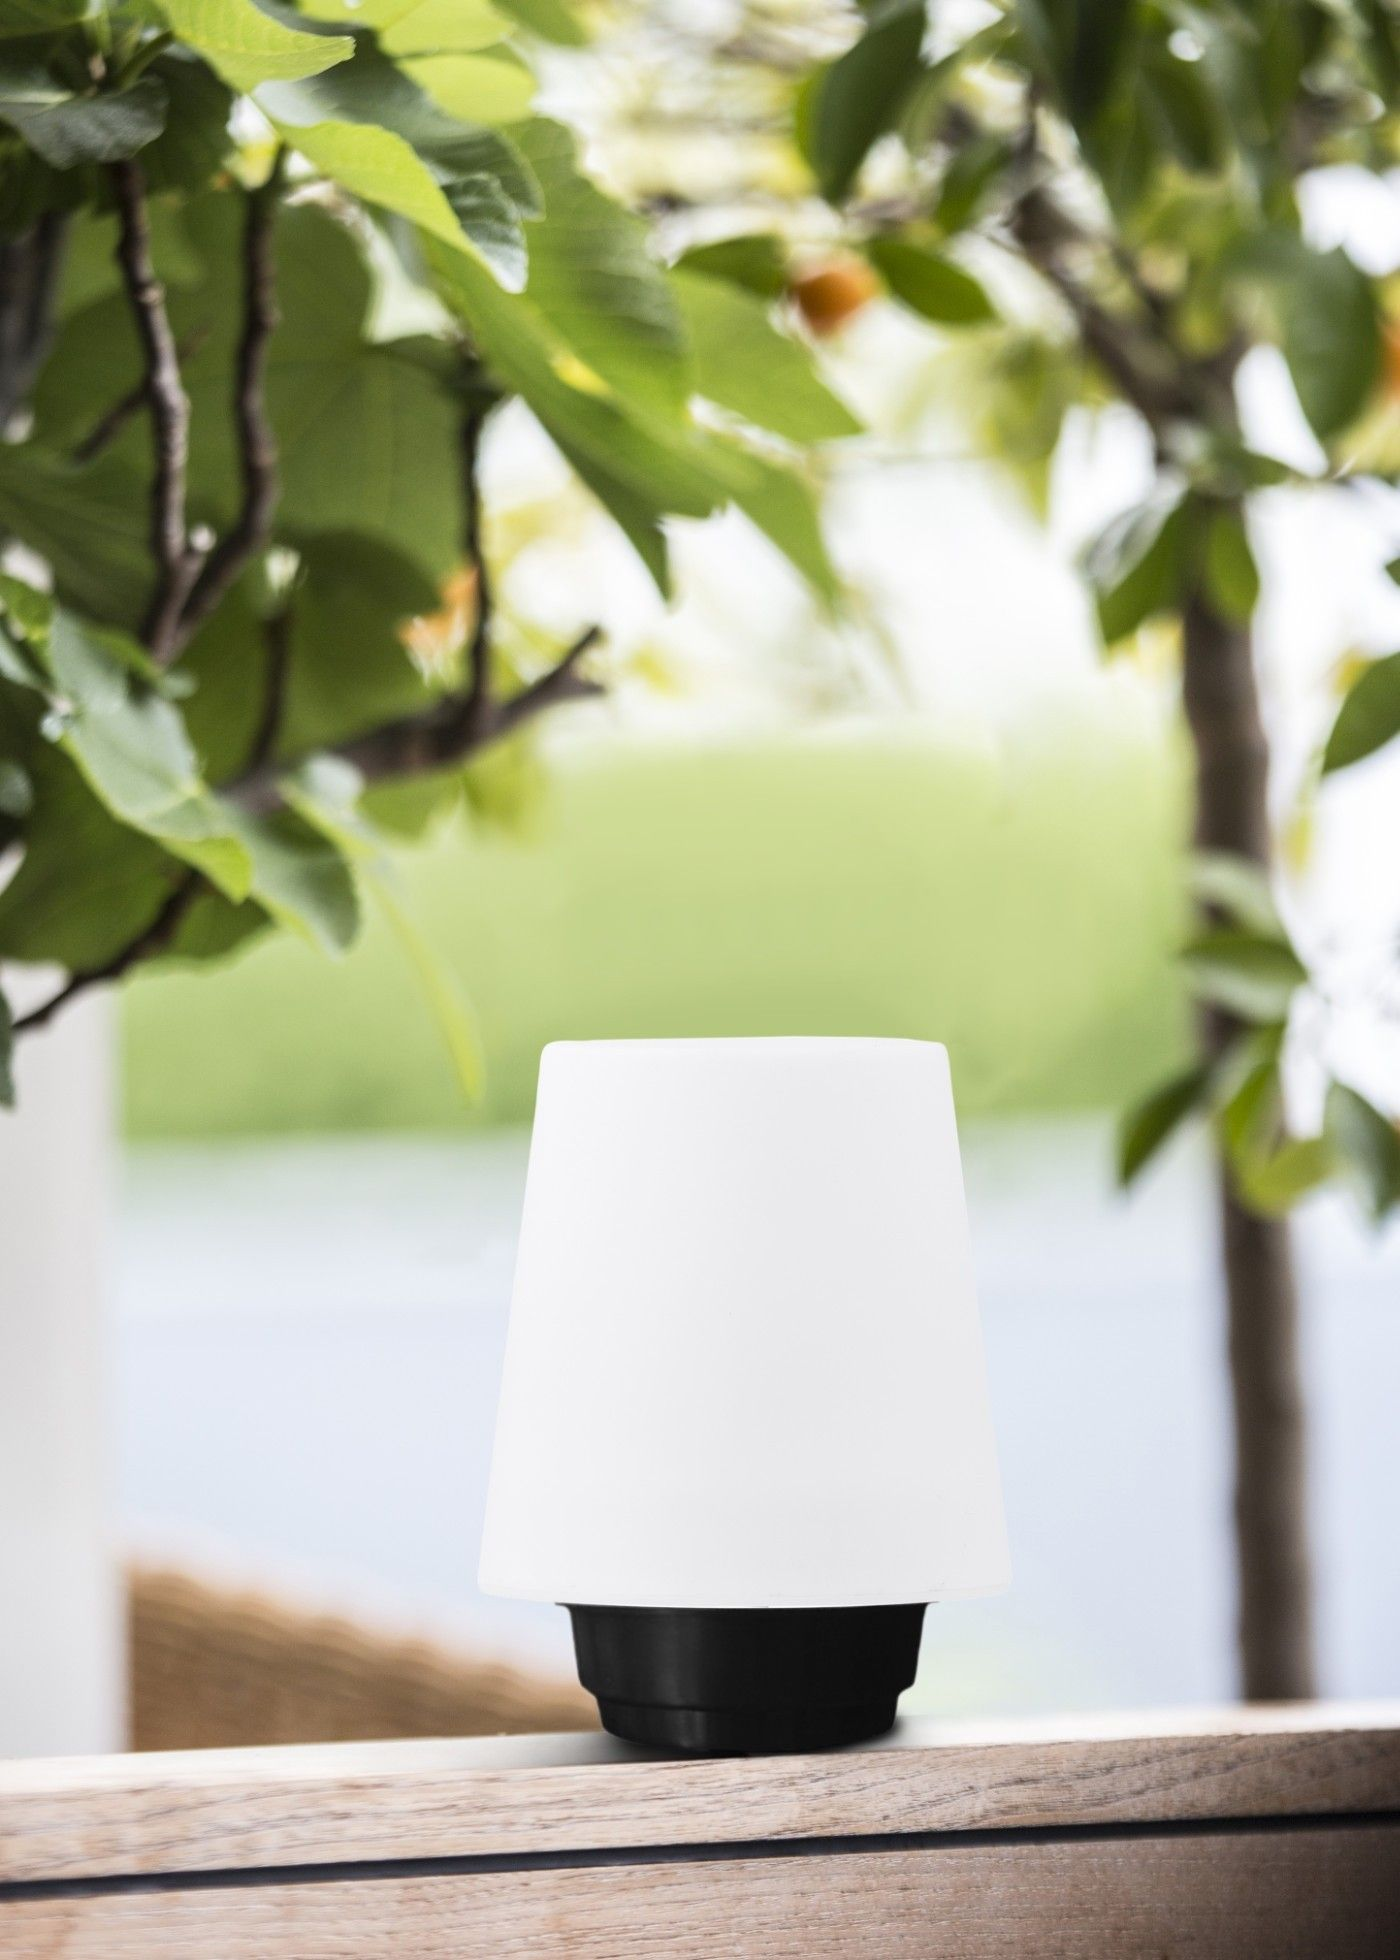 Gacoli Checkmate No.1 Dock tafellamp - klein GA900116 Verlichting ...